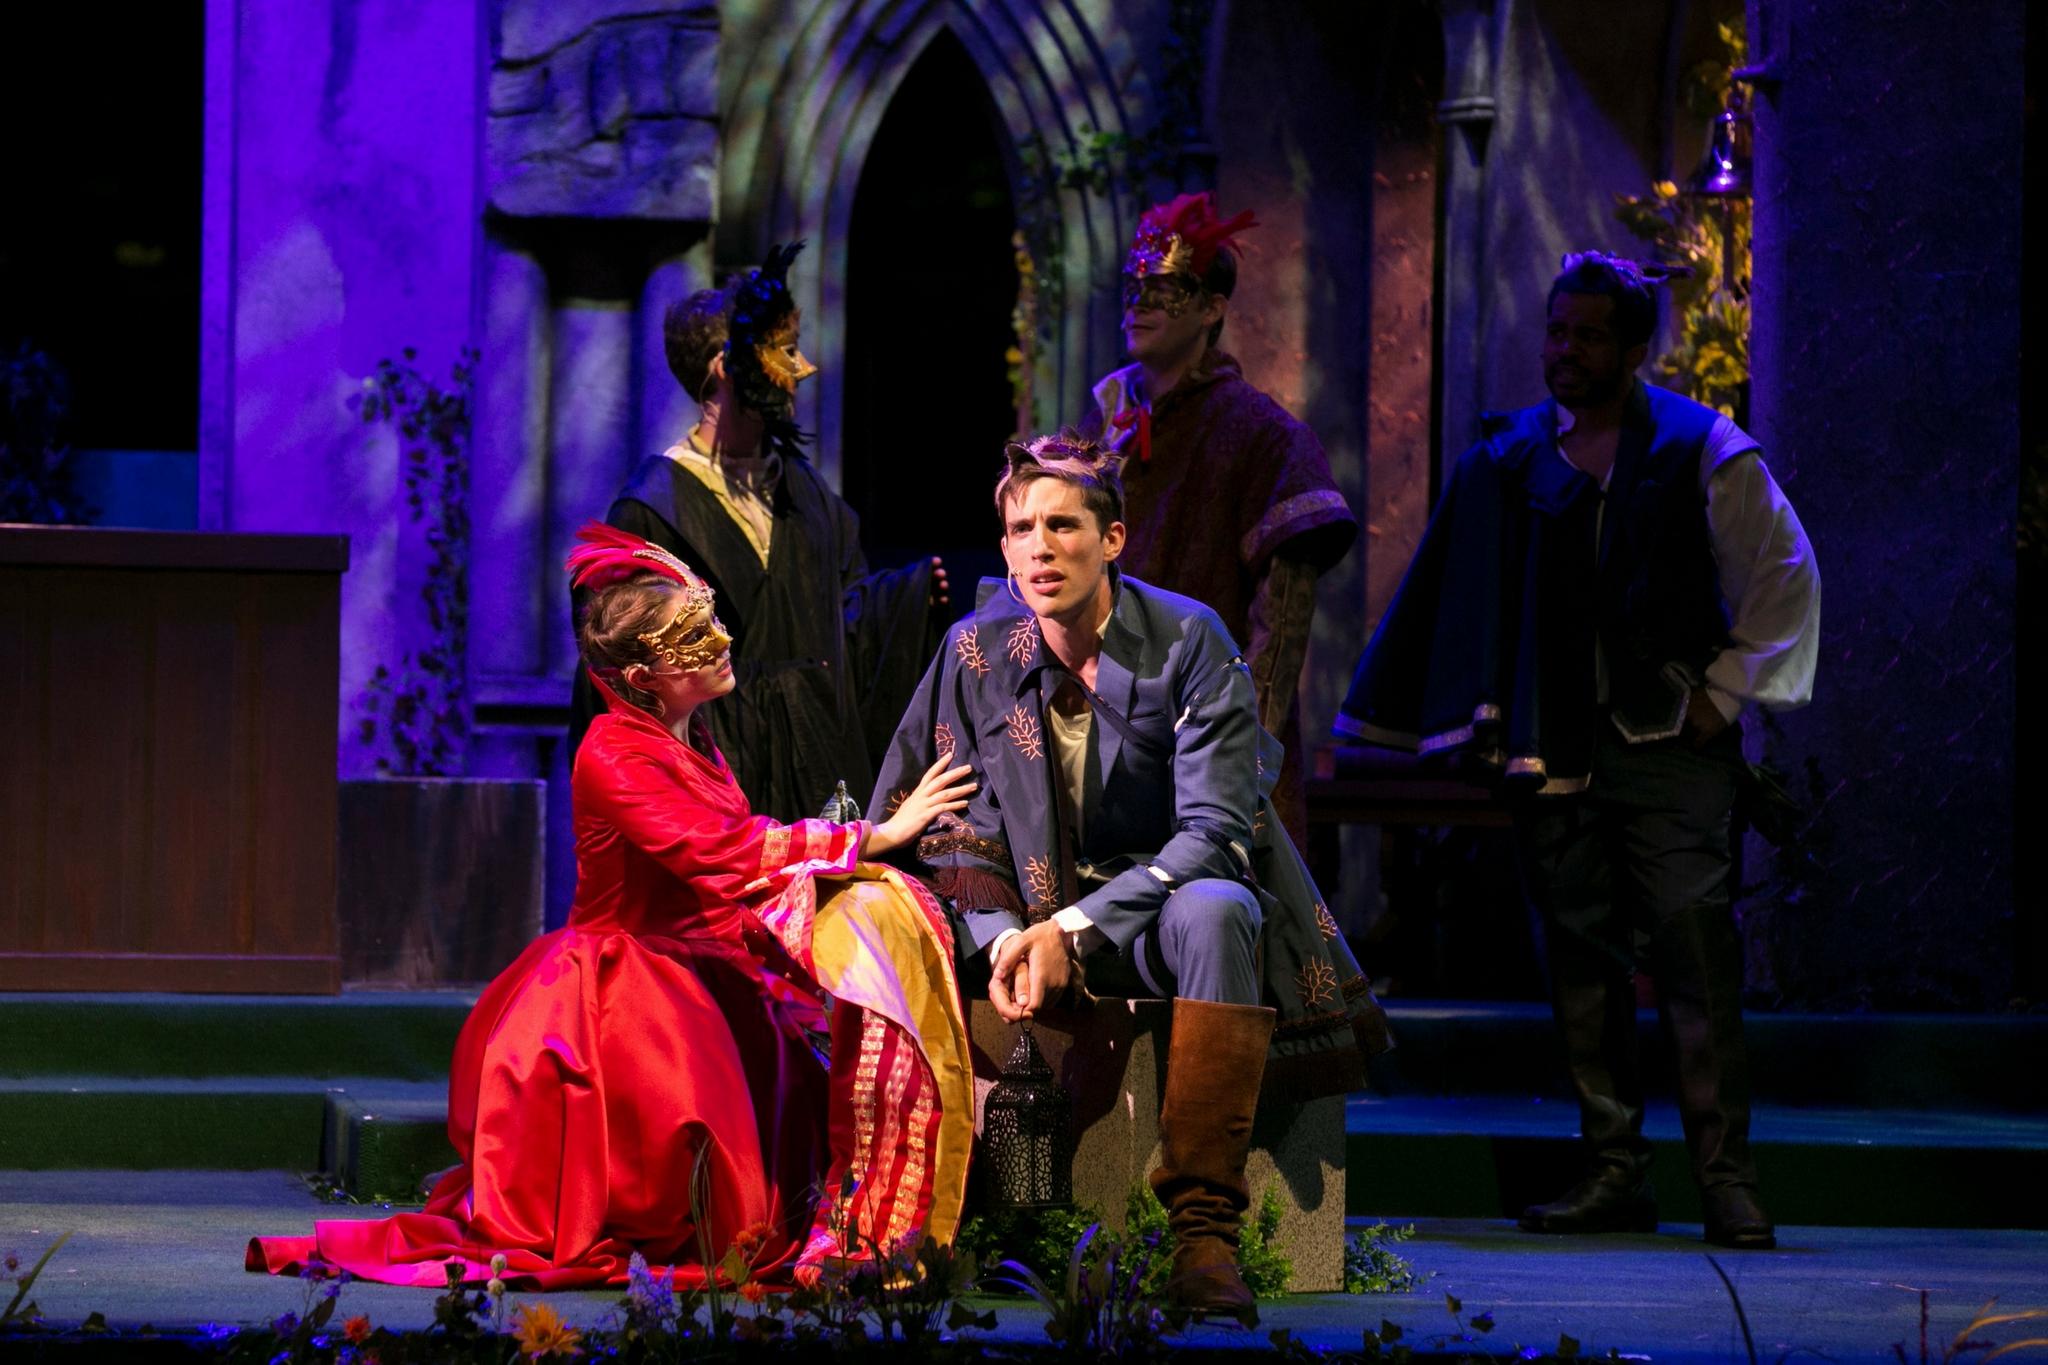 Sarah Mass (Verona Citizen) and John Zdrojeski (Romeo) in Romeo & Juliet, Shakespeare on the Common 2017-Photo by Evgenia Eliseeva